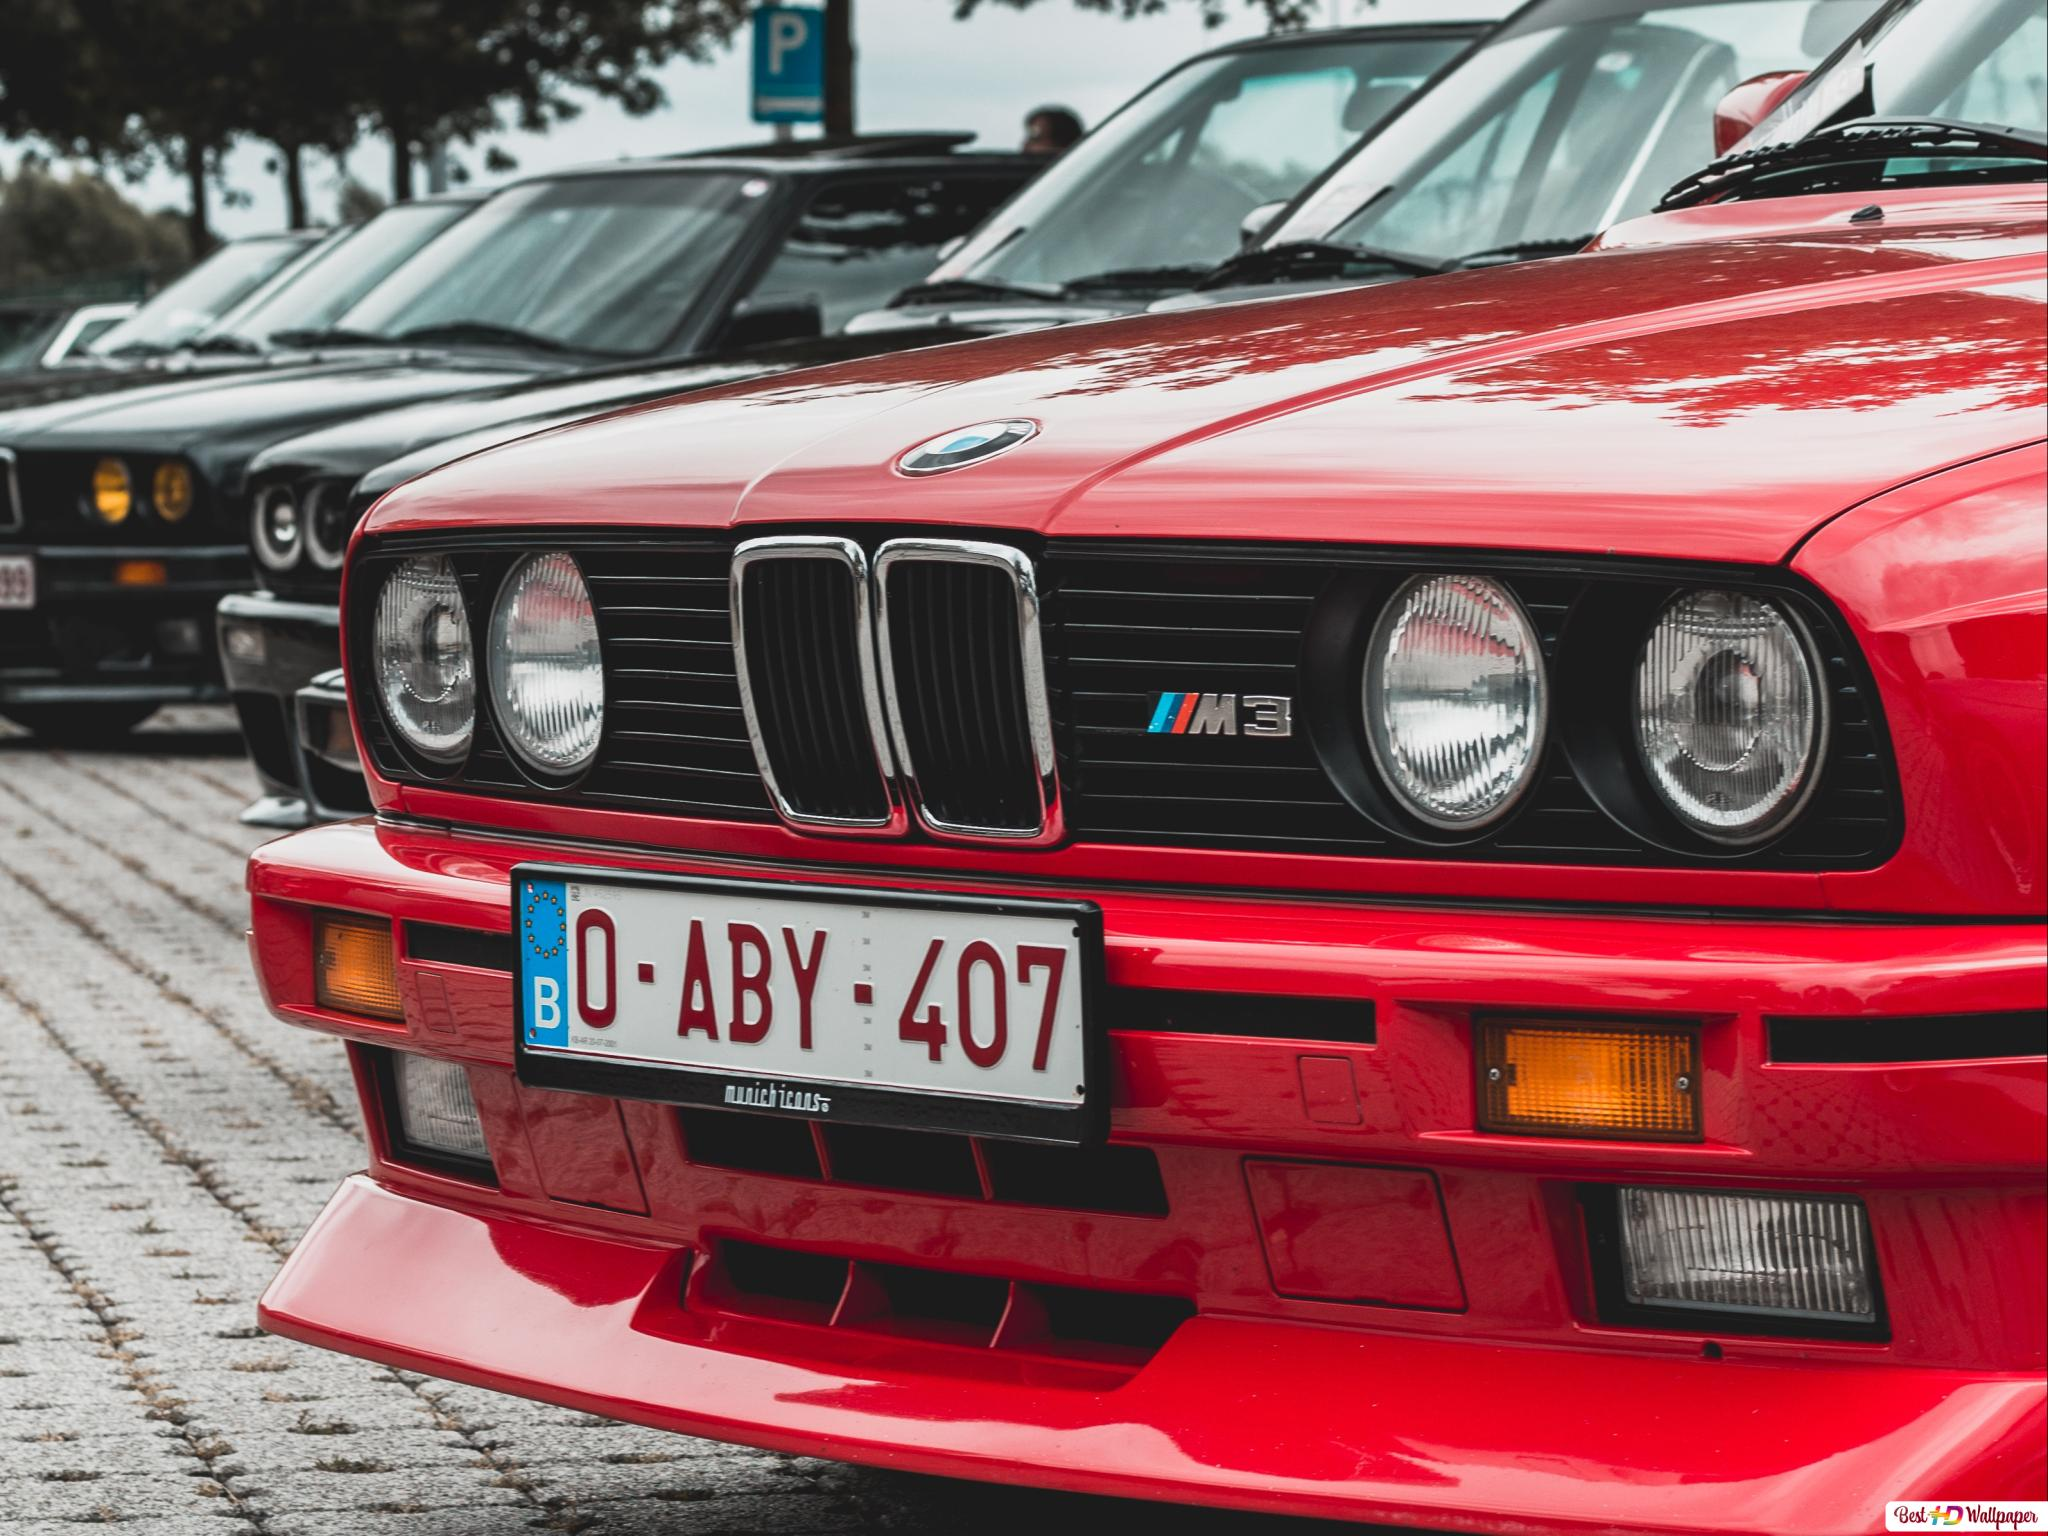 Red Bmw E30 Car Hd Wallpaper Download